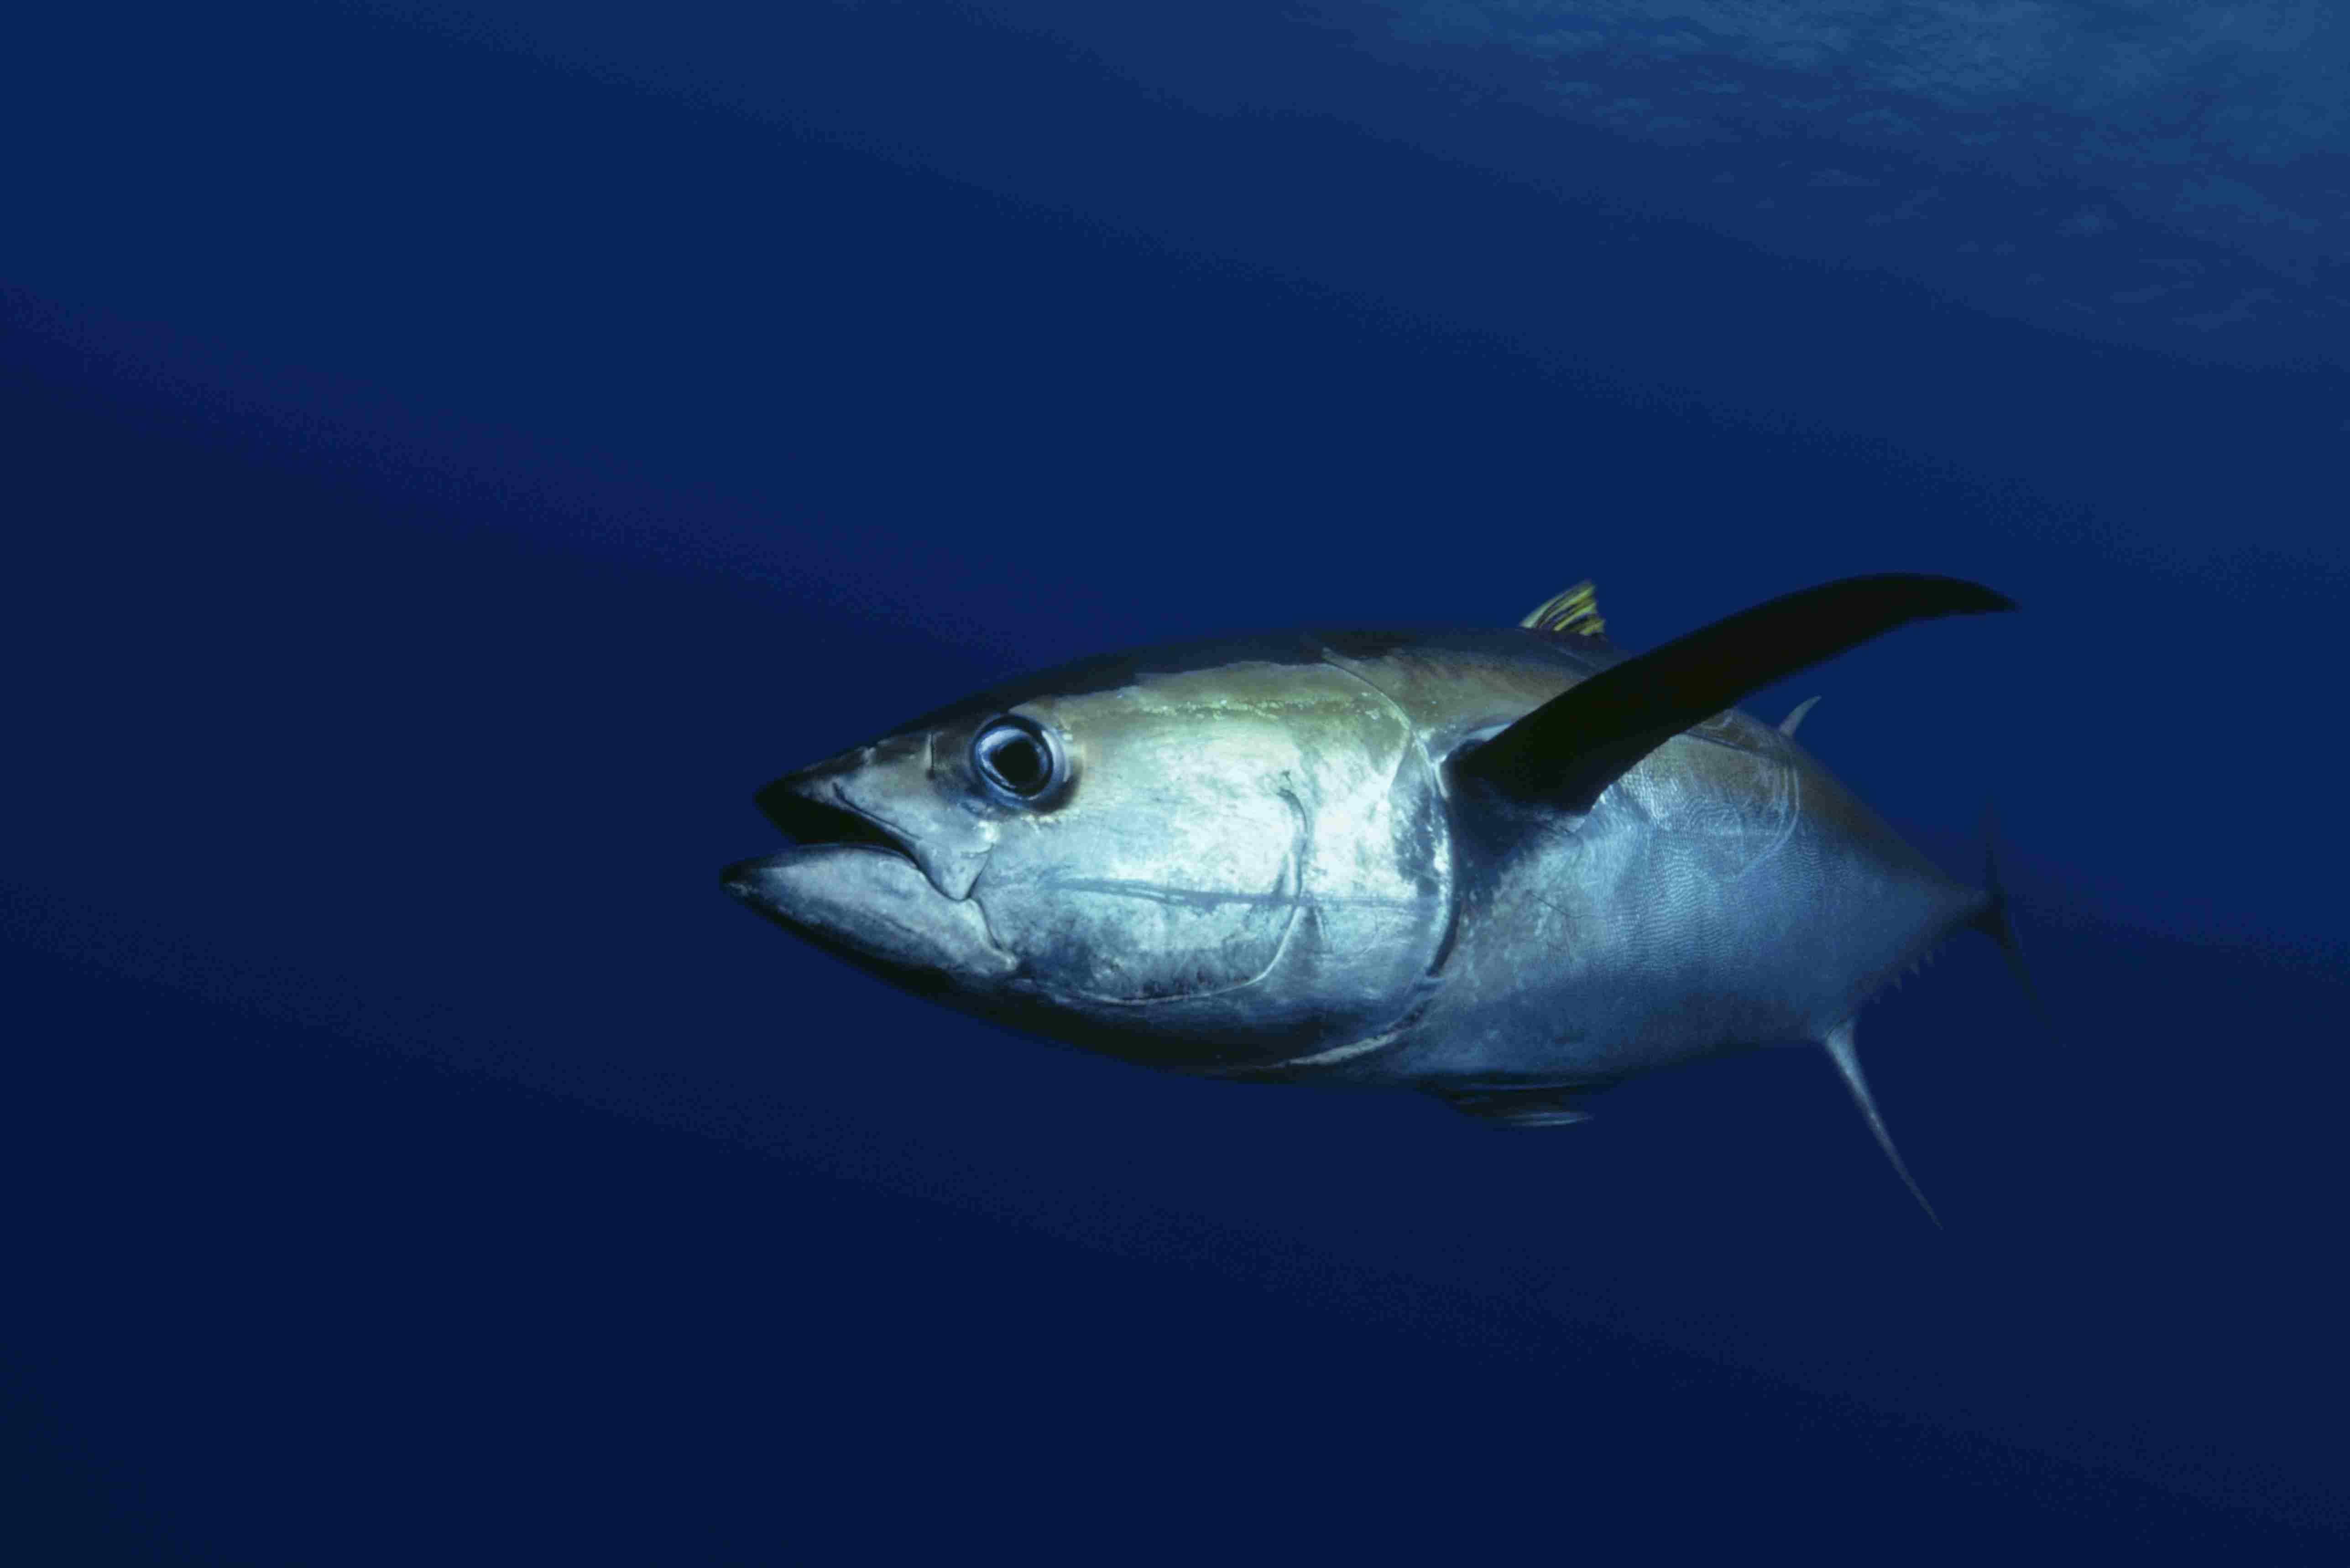 Yellowfin tuna serving side eye in dark blue